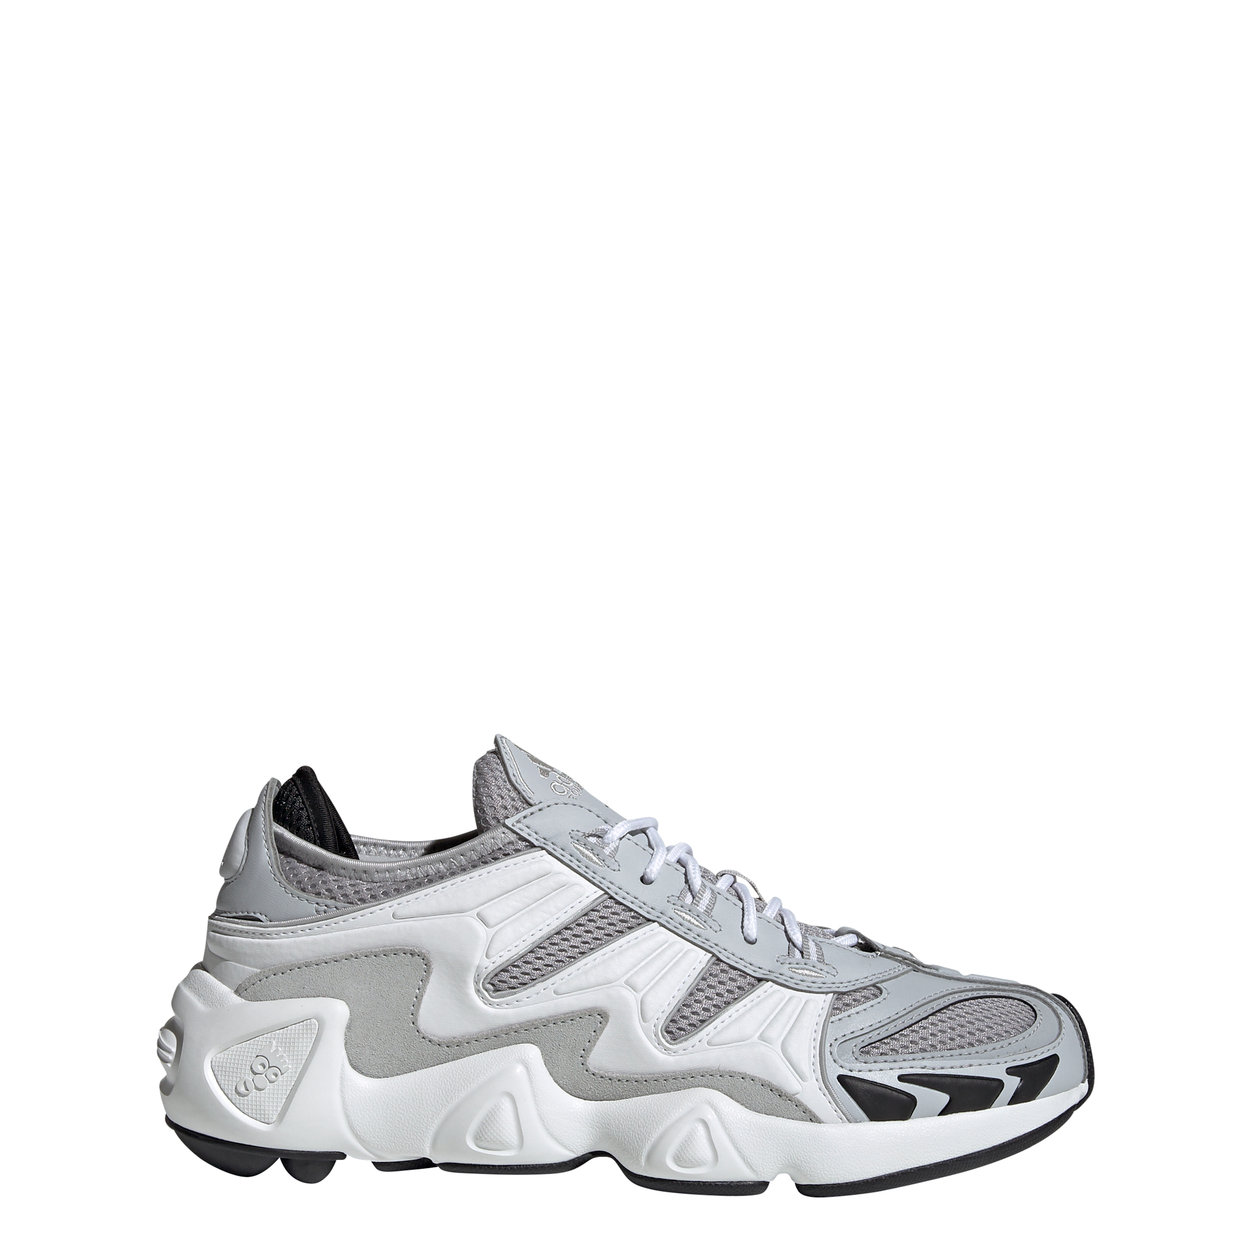 Image of Sneakers Adidas FYW S-97 multicolor